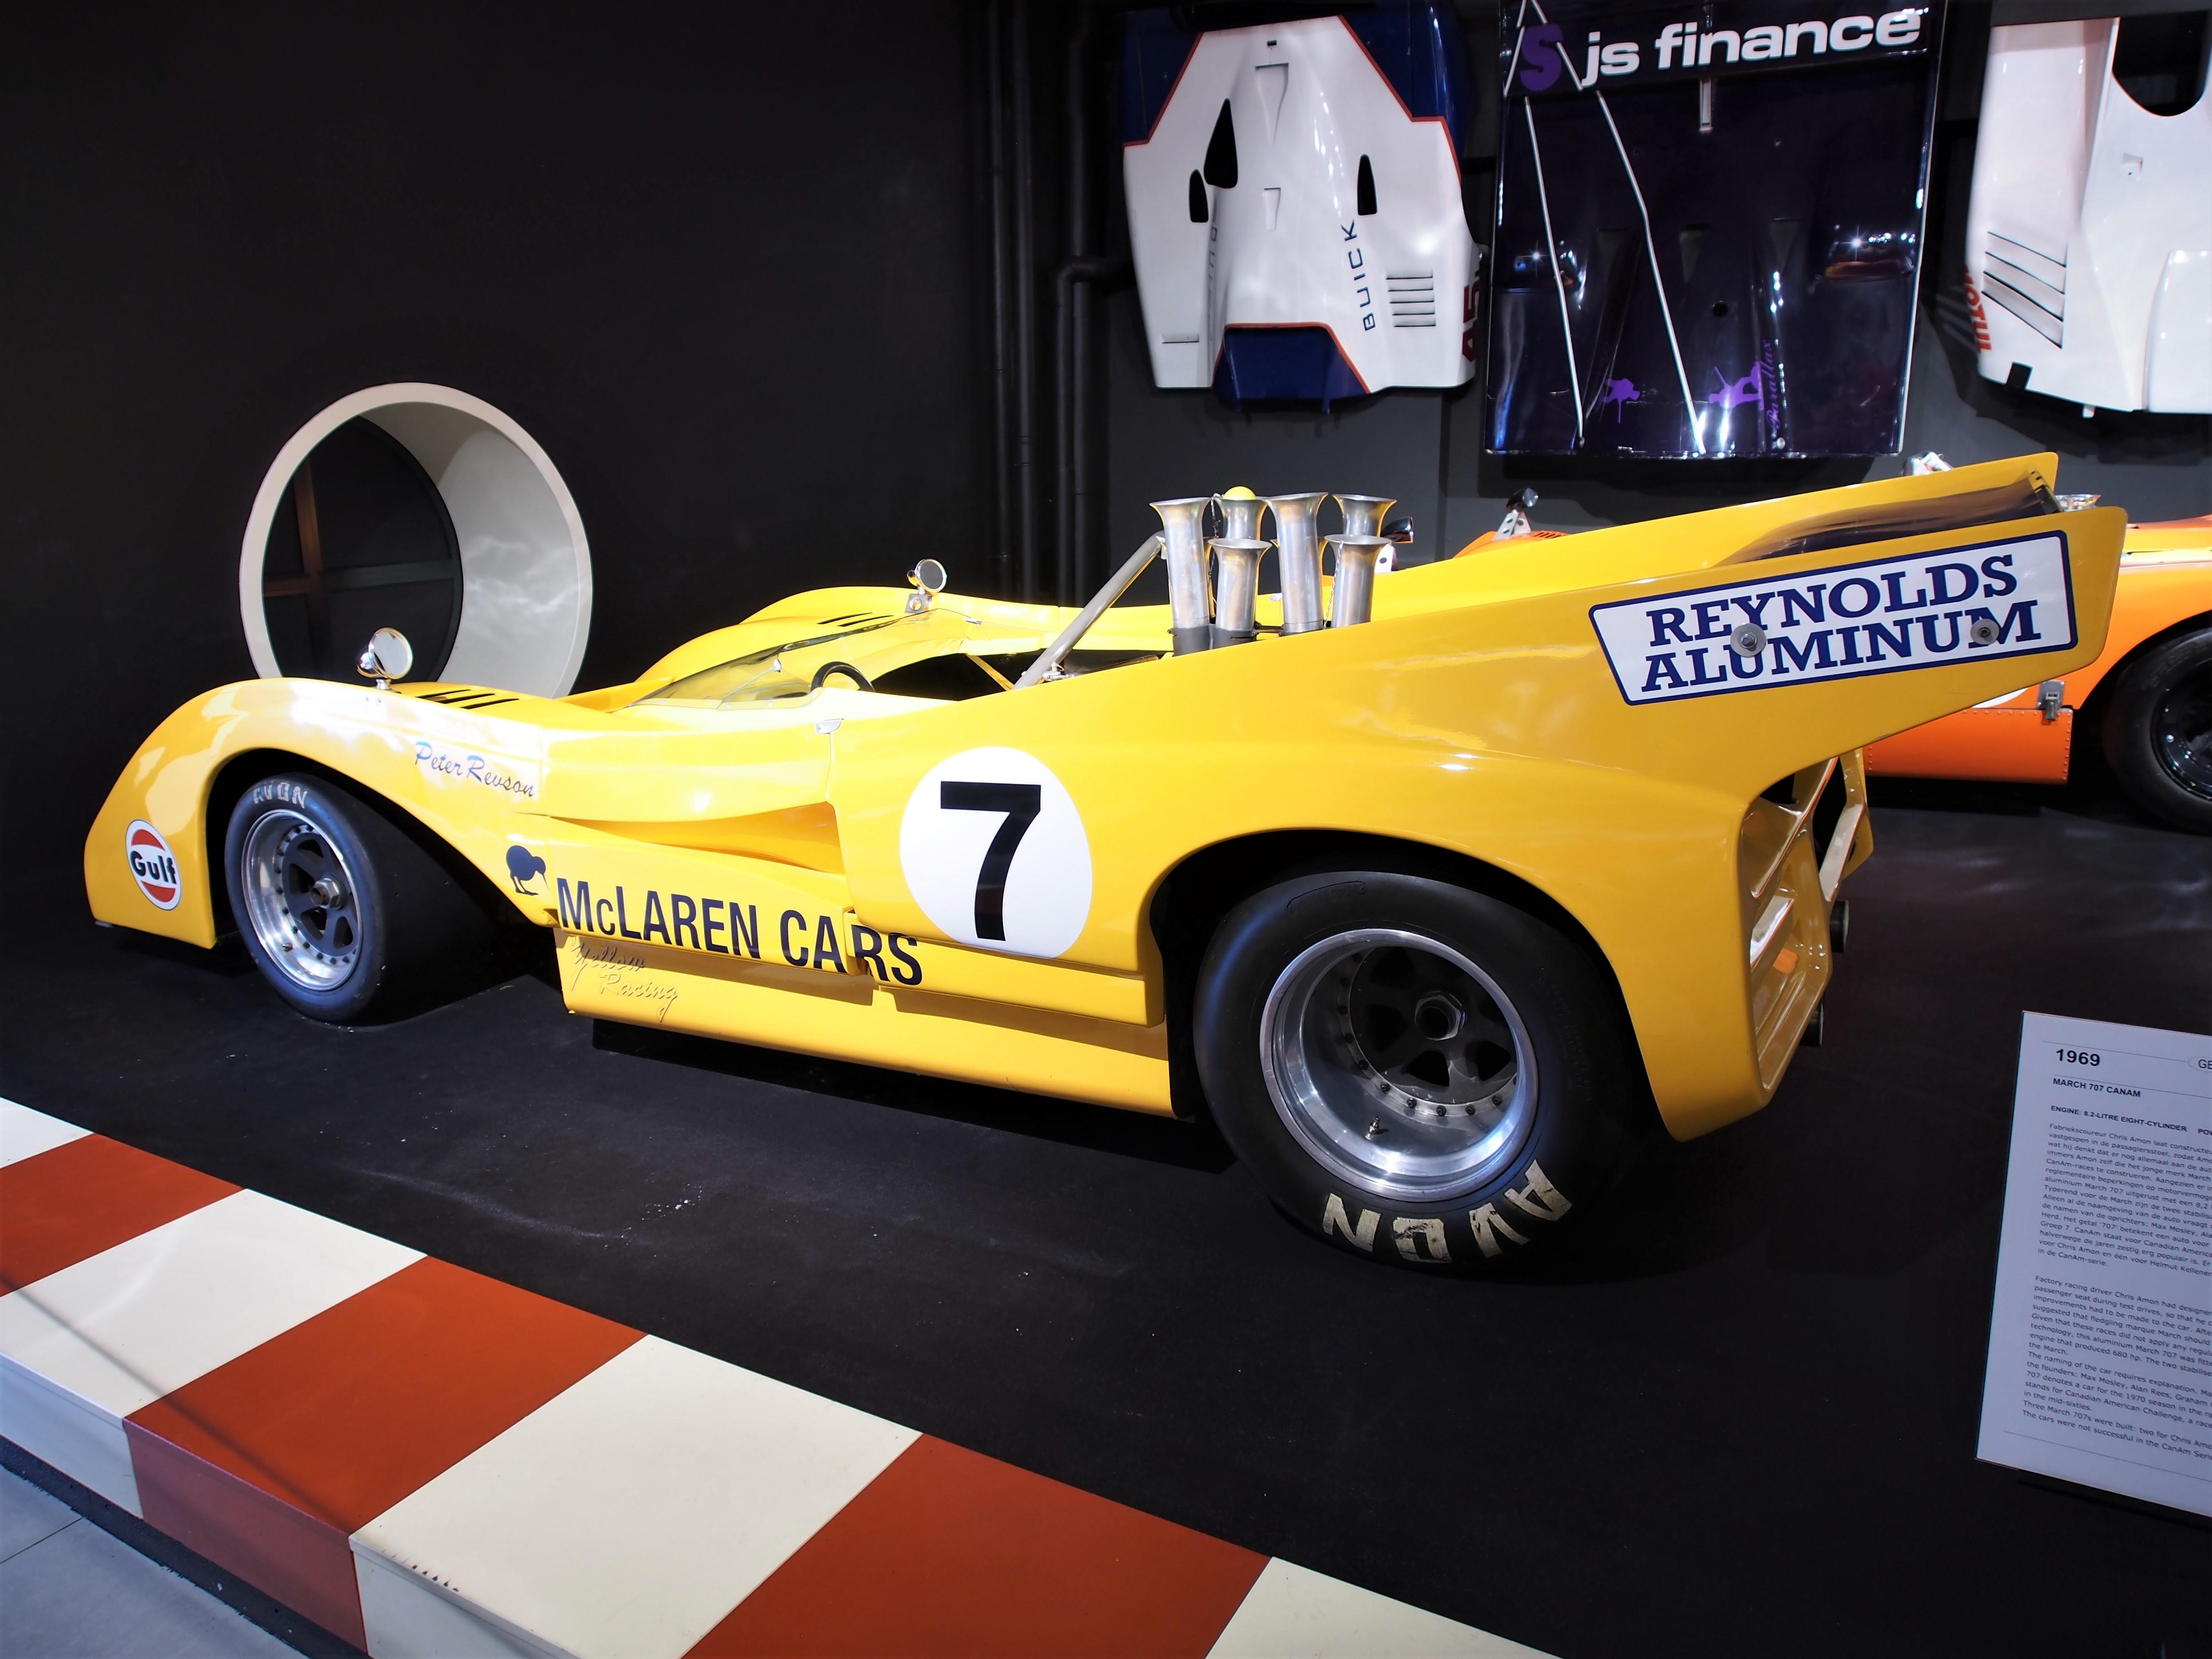 File:1971 McLaren M8F 8 1 litre 8 cylinder 750hp photo 4 JPG